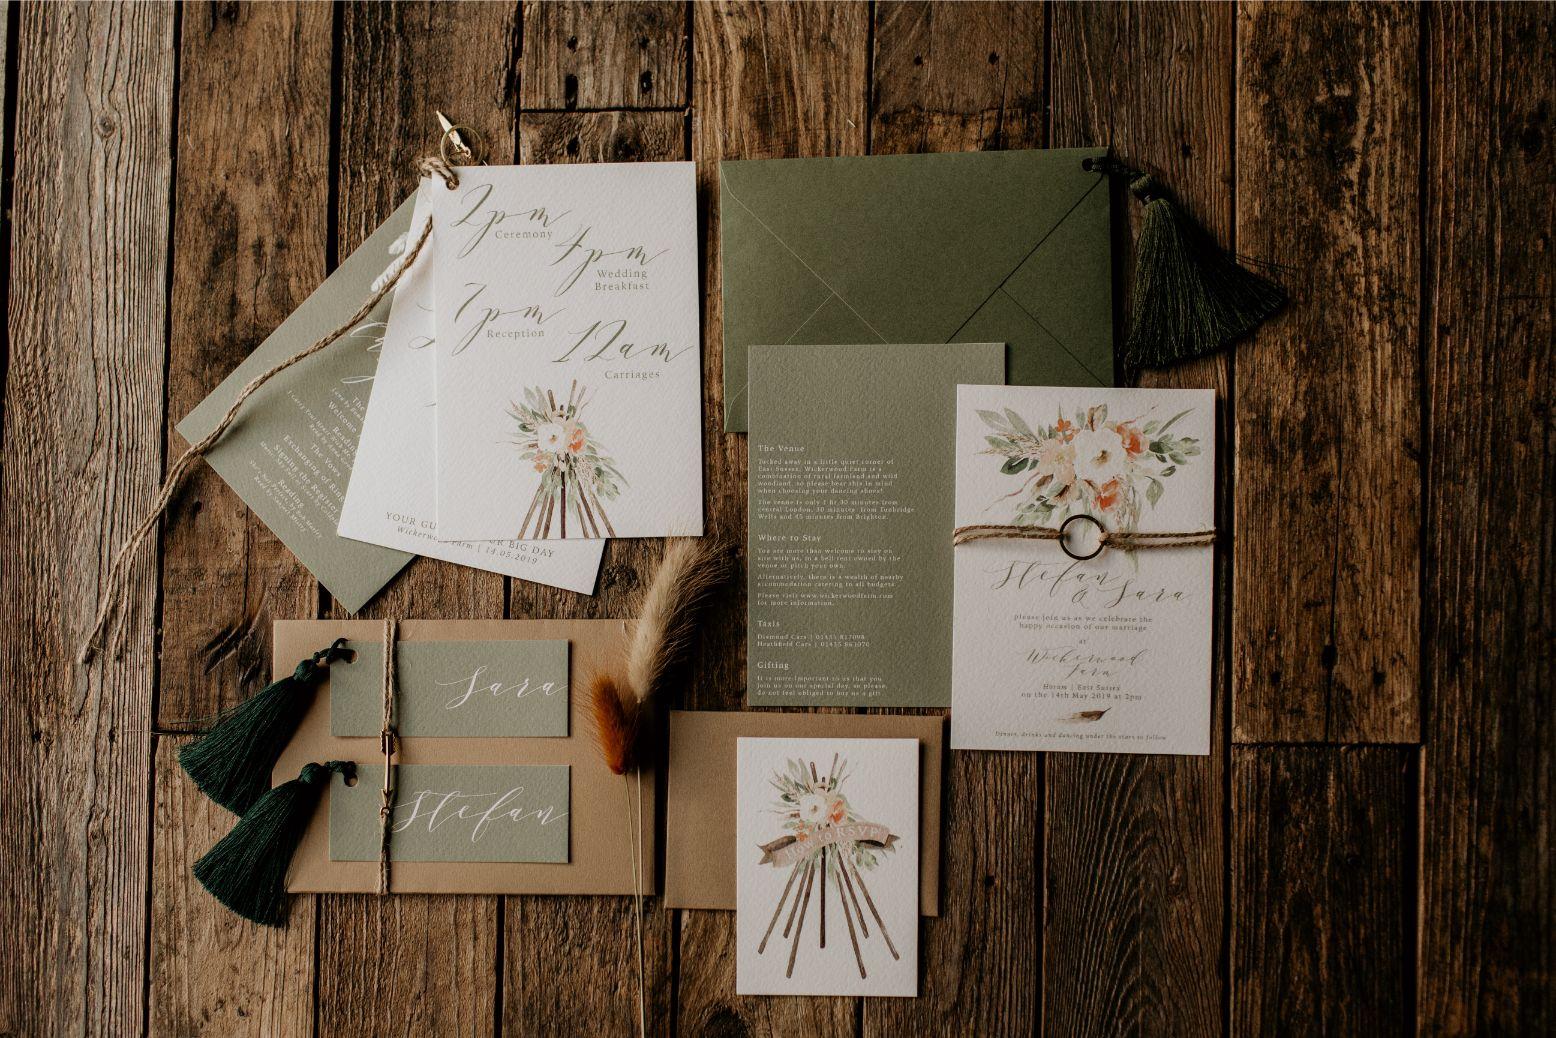 elena popa photography stationery wedding invitations invites menus signage